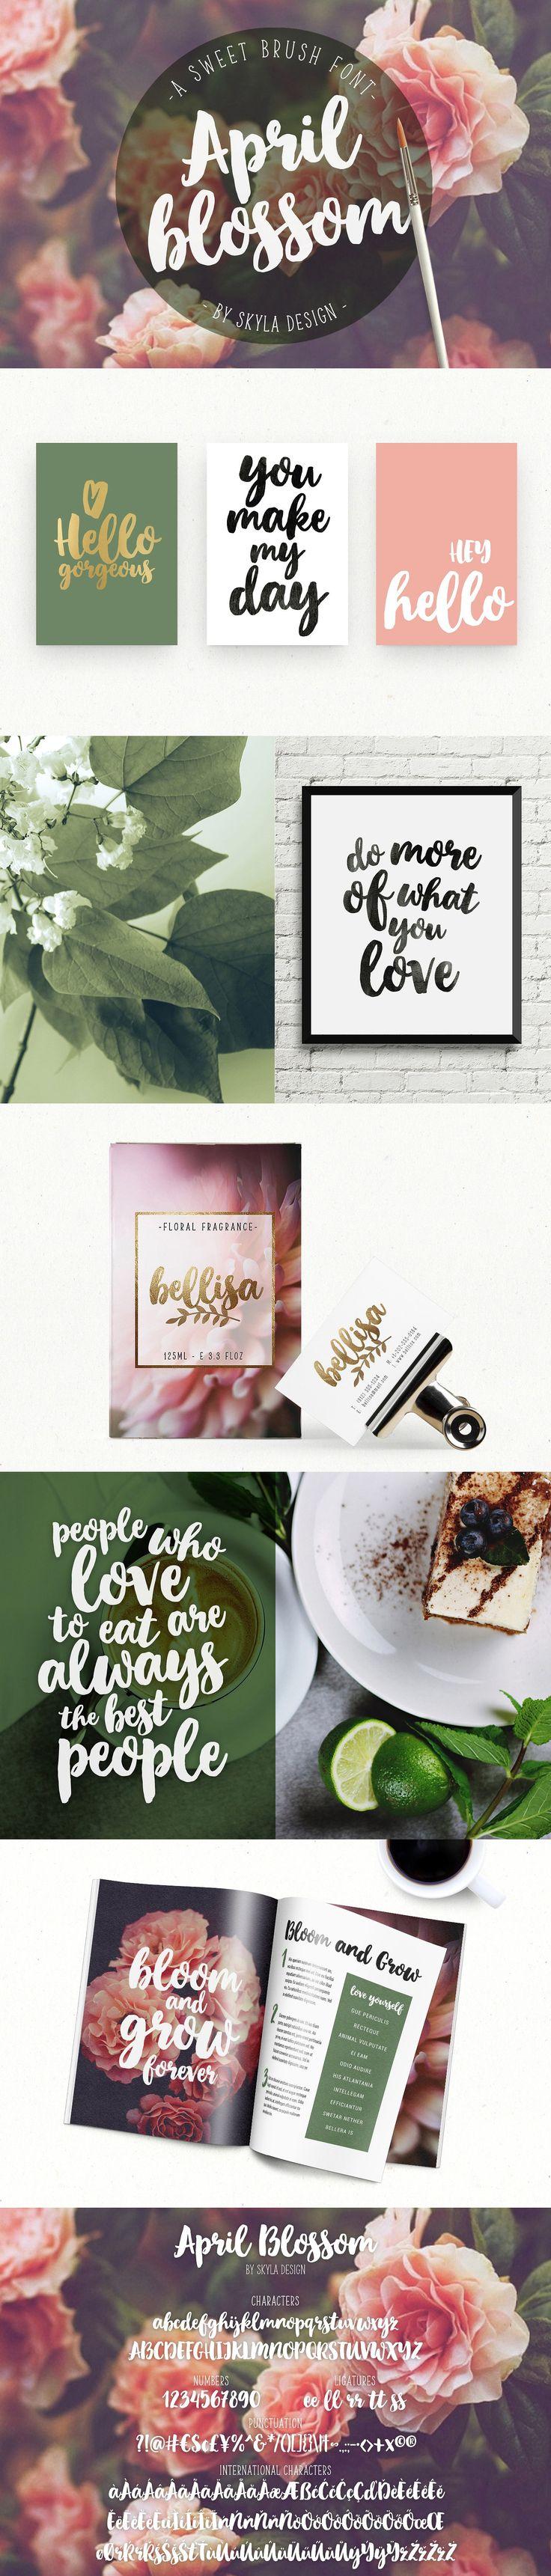 Script brush font, April blossom by Skyla Design on @creativemarket